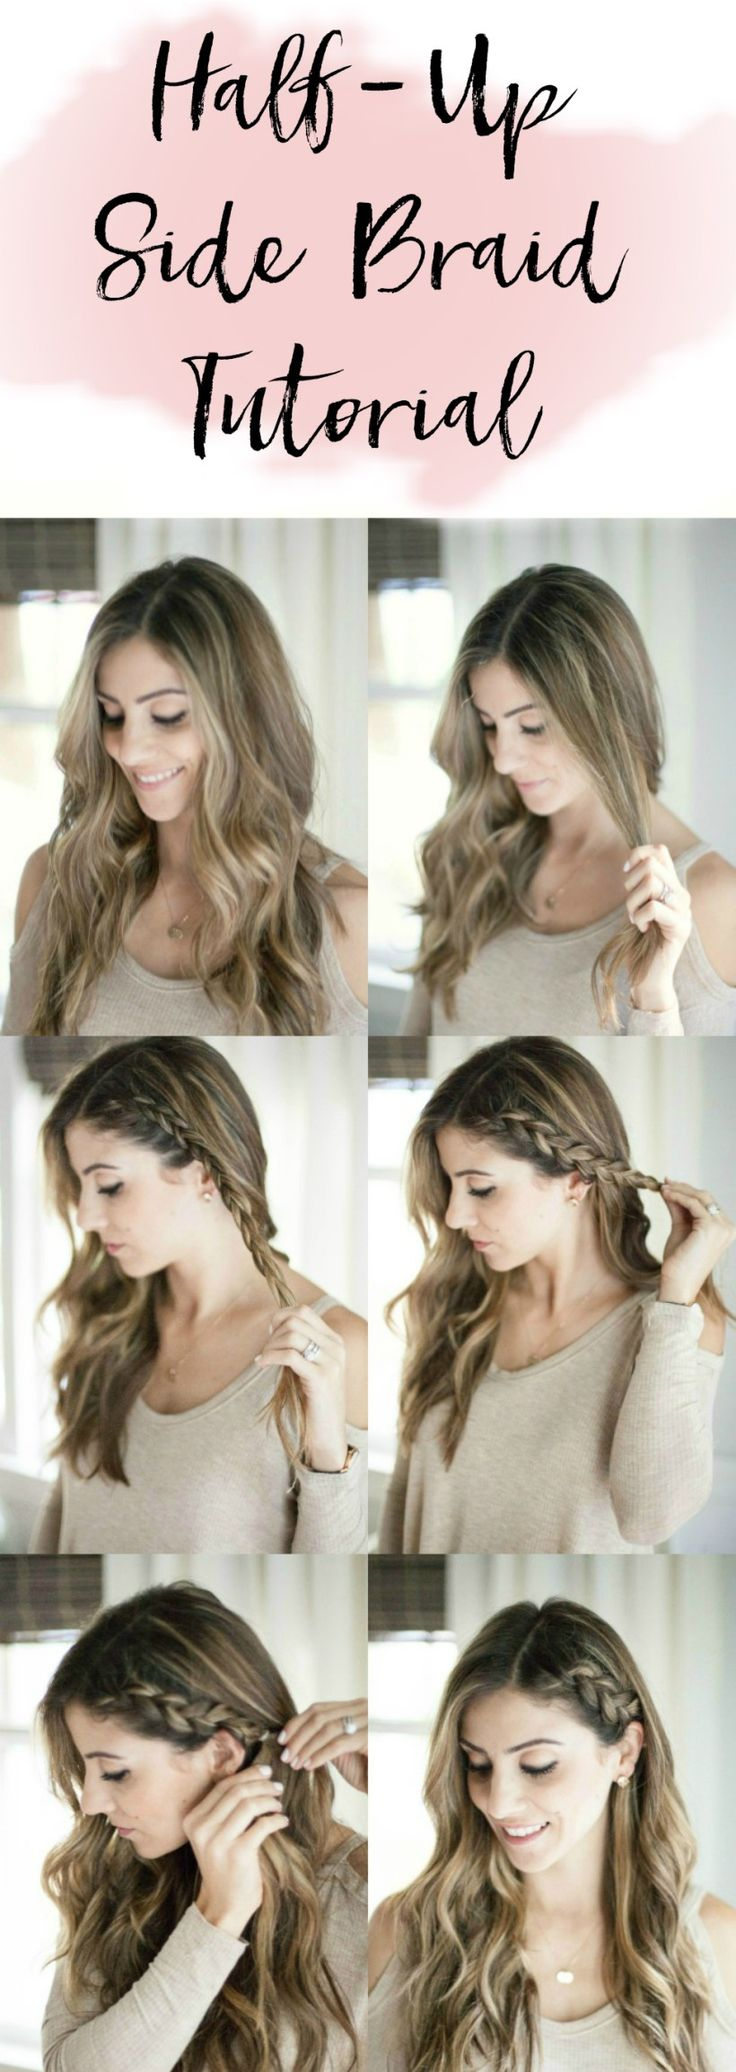 Astonishing 1000 Ideas About Braided Hair Tutorials On Pinterest Braid Hair Short Hairstyles For Black Women Fulllsitofus